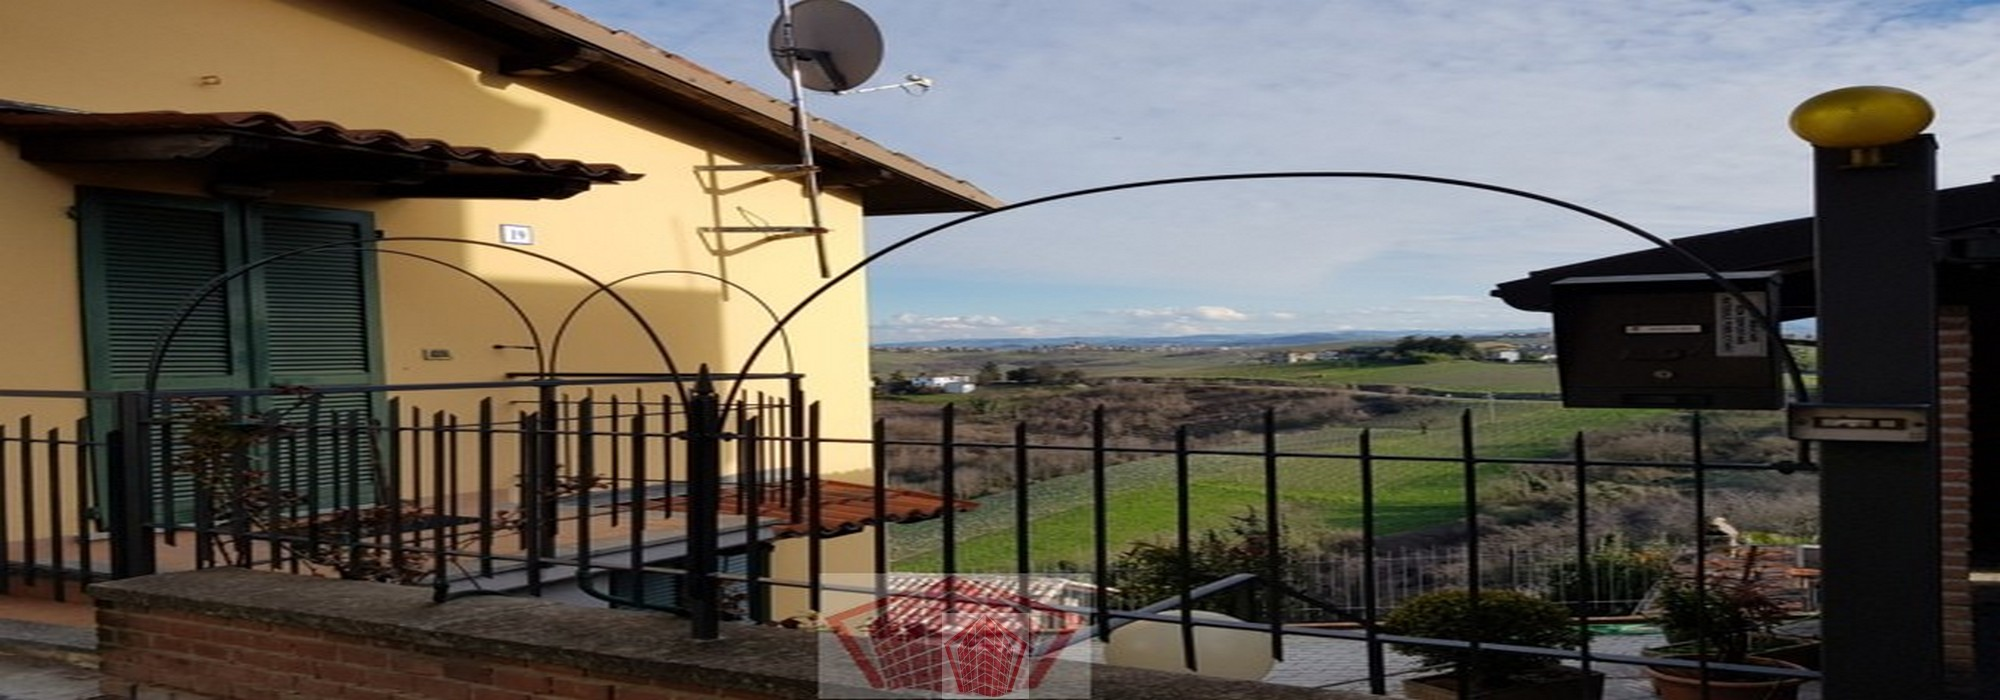 Montu' Beccaria (PV) VENDITA Villino con vista panoramica Rif. 361